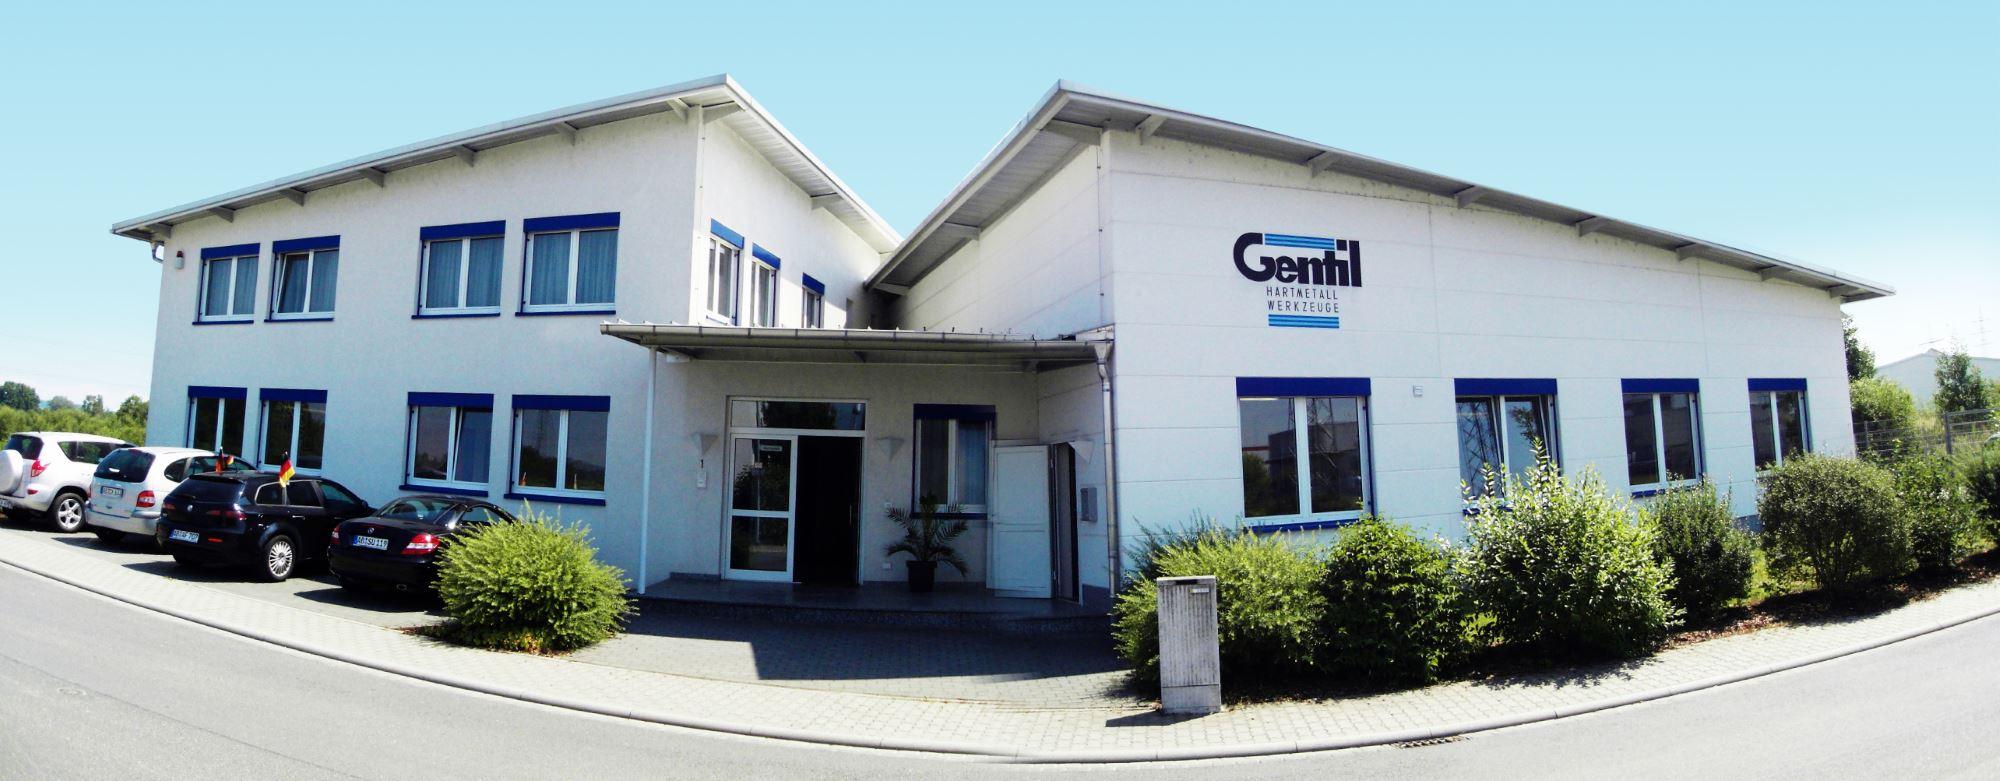 Gentil-Firmengebäude